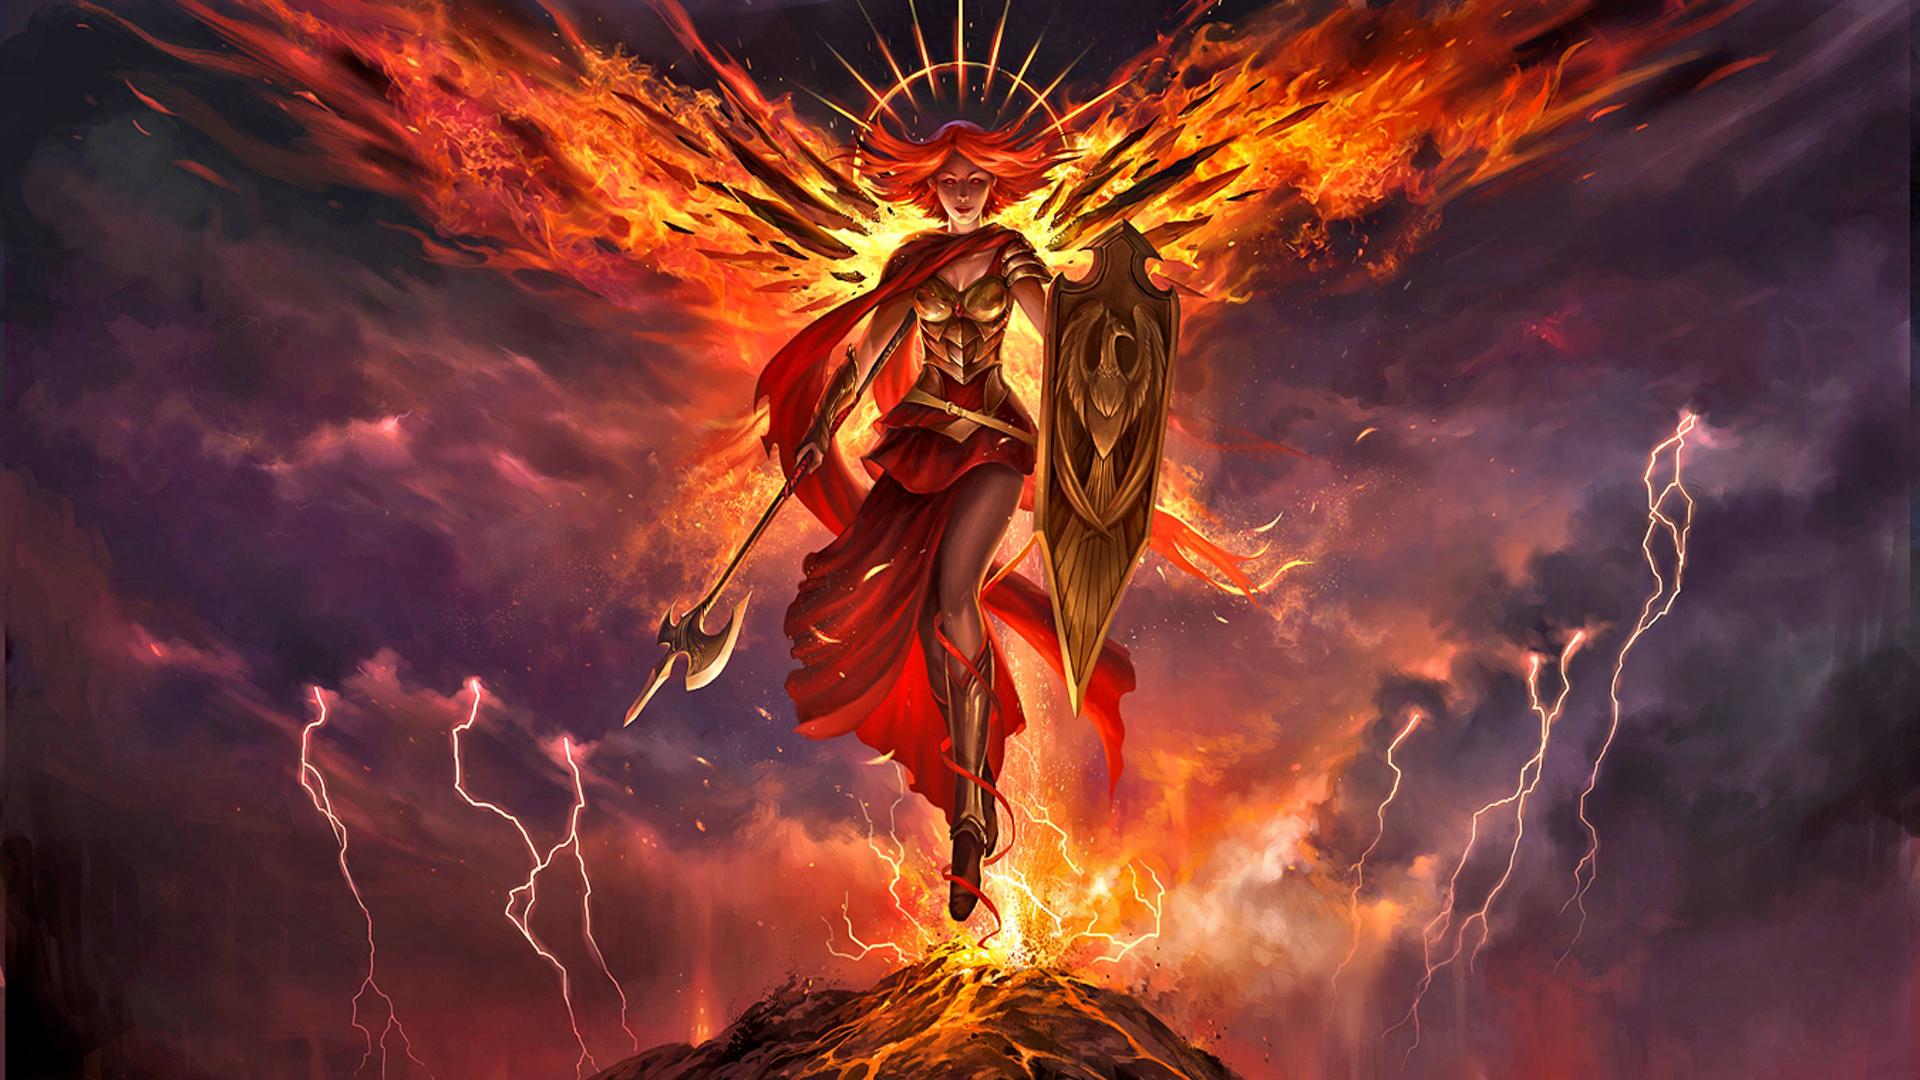 Angel Warrior Magic The Gathering Wallpaper, HD Games 4K ...